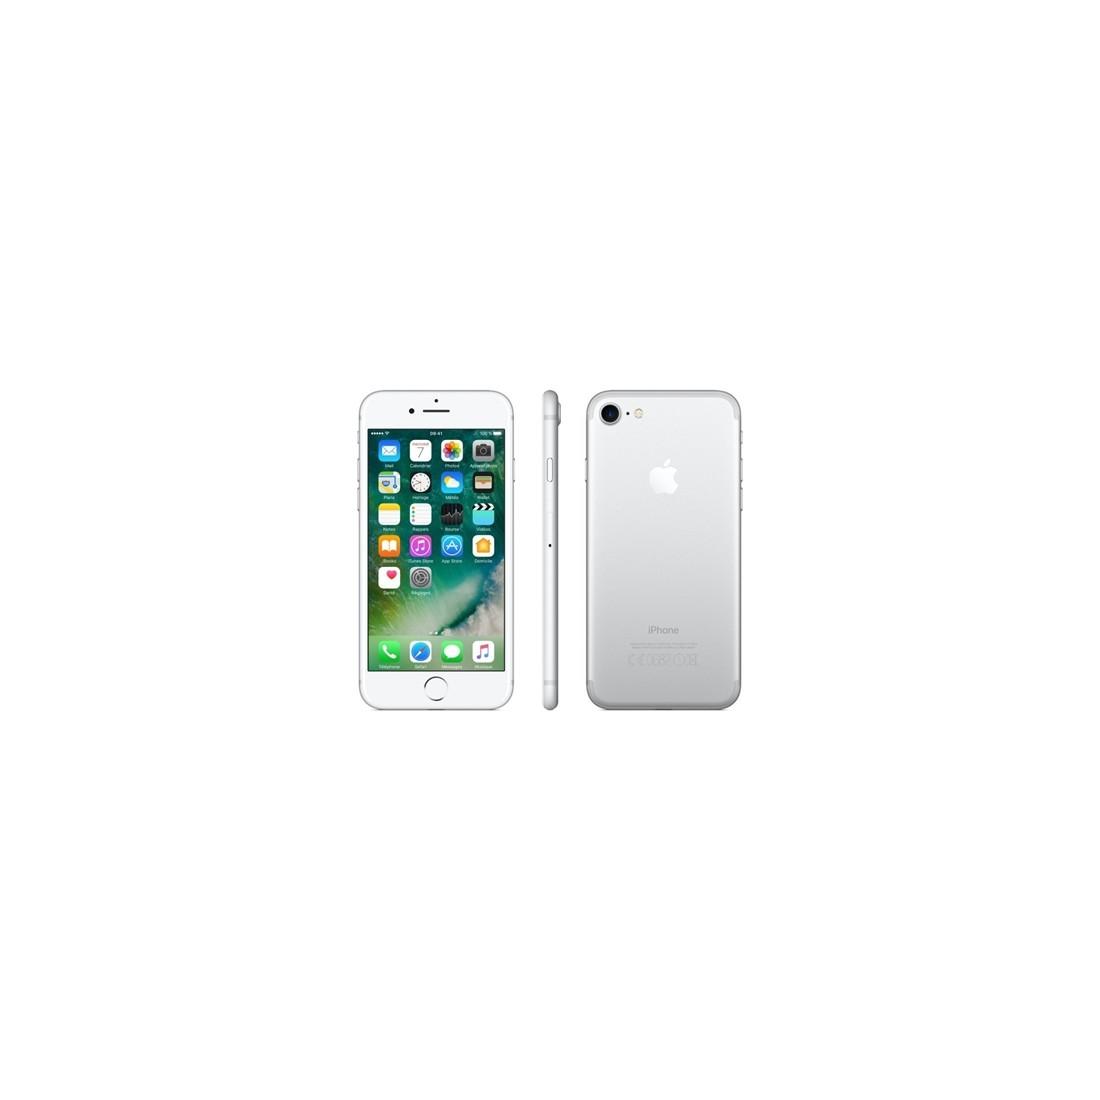 CKP iPhone 7 Semi Nuevo 128GB Plata